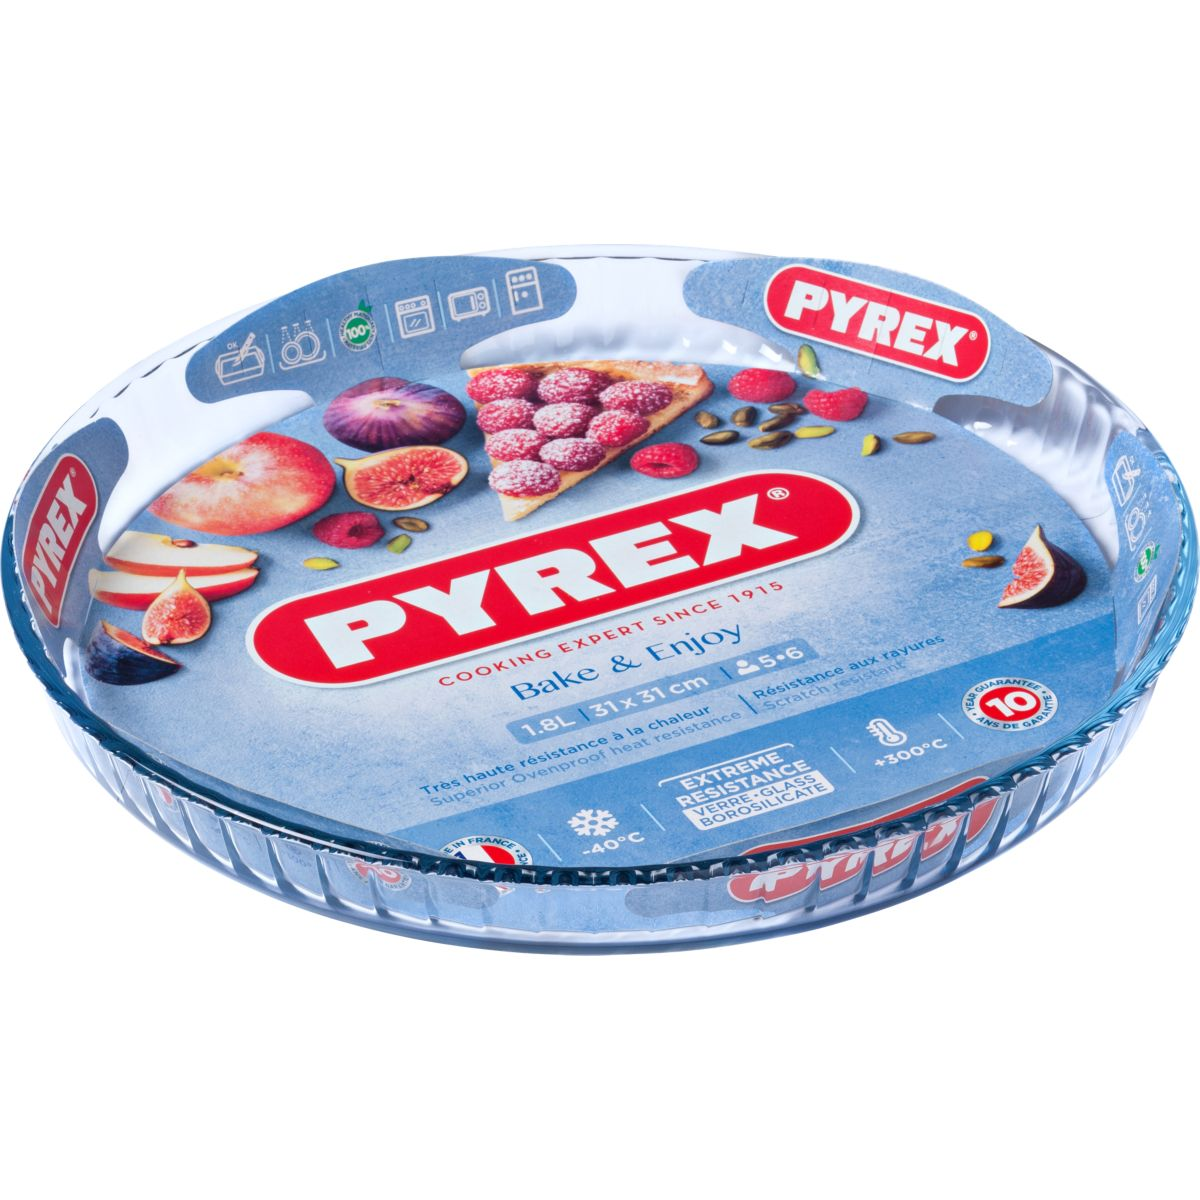 Moule à tarte PYREX diam 30 cm Classic (photo)